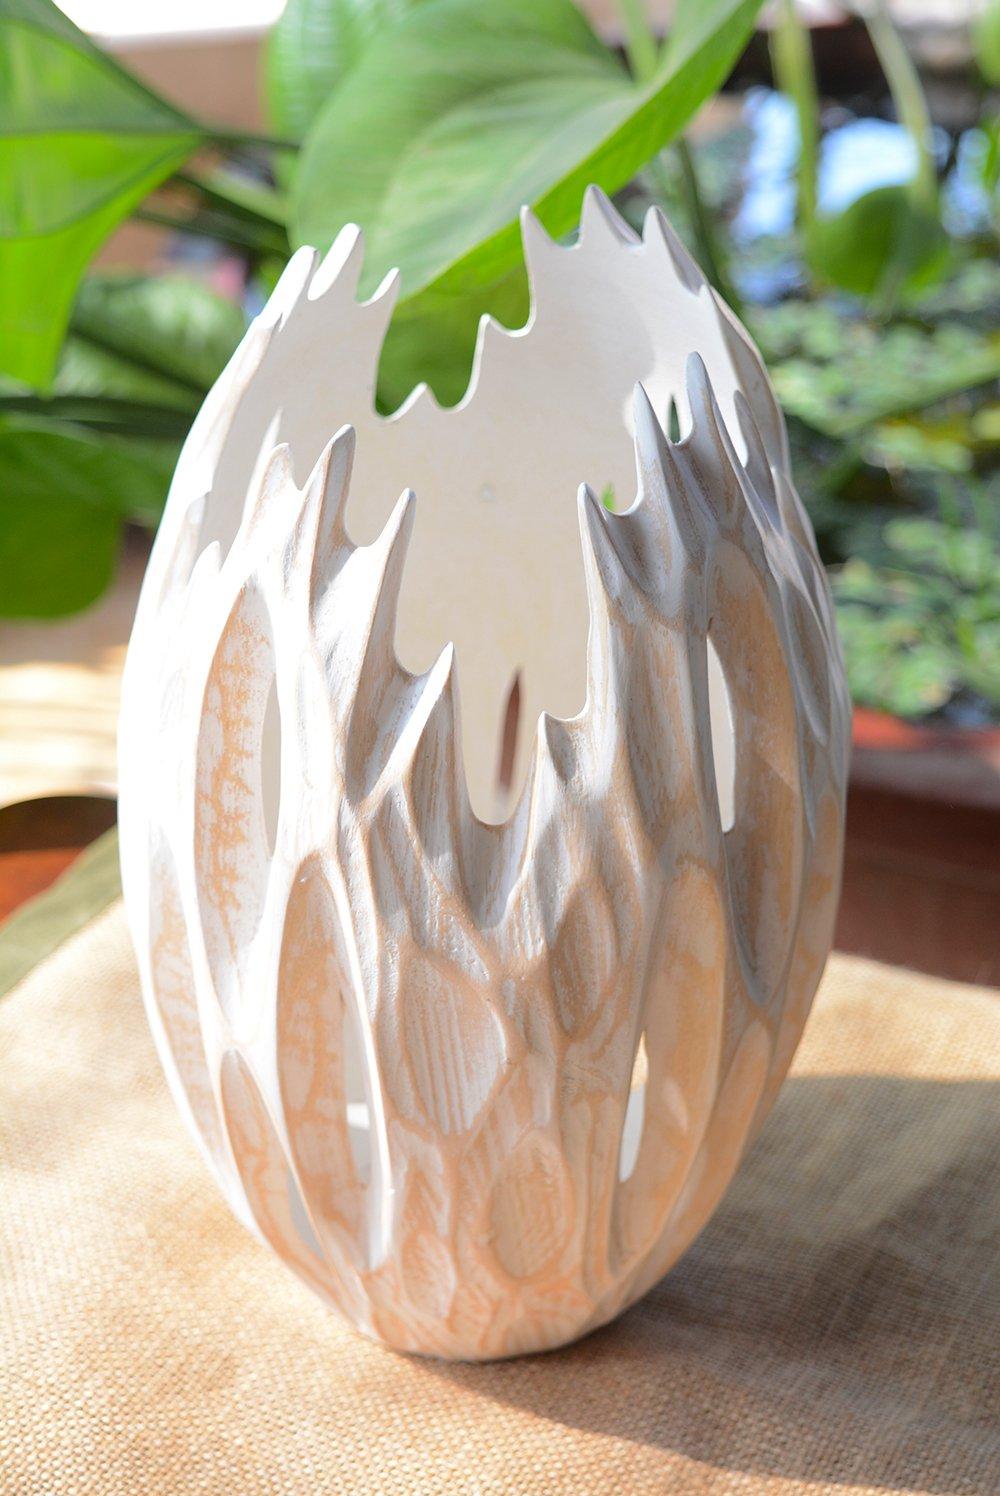 Roro Minimalist Handcarved Wood Vase with Upward Grooves (Whitewash) by roro (Image #3)